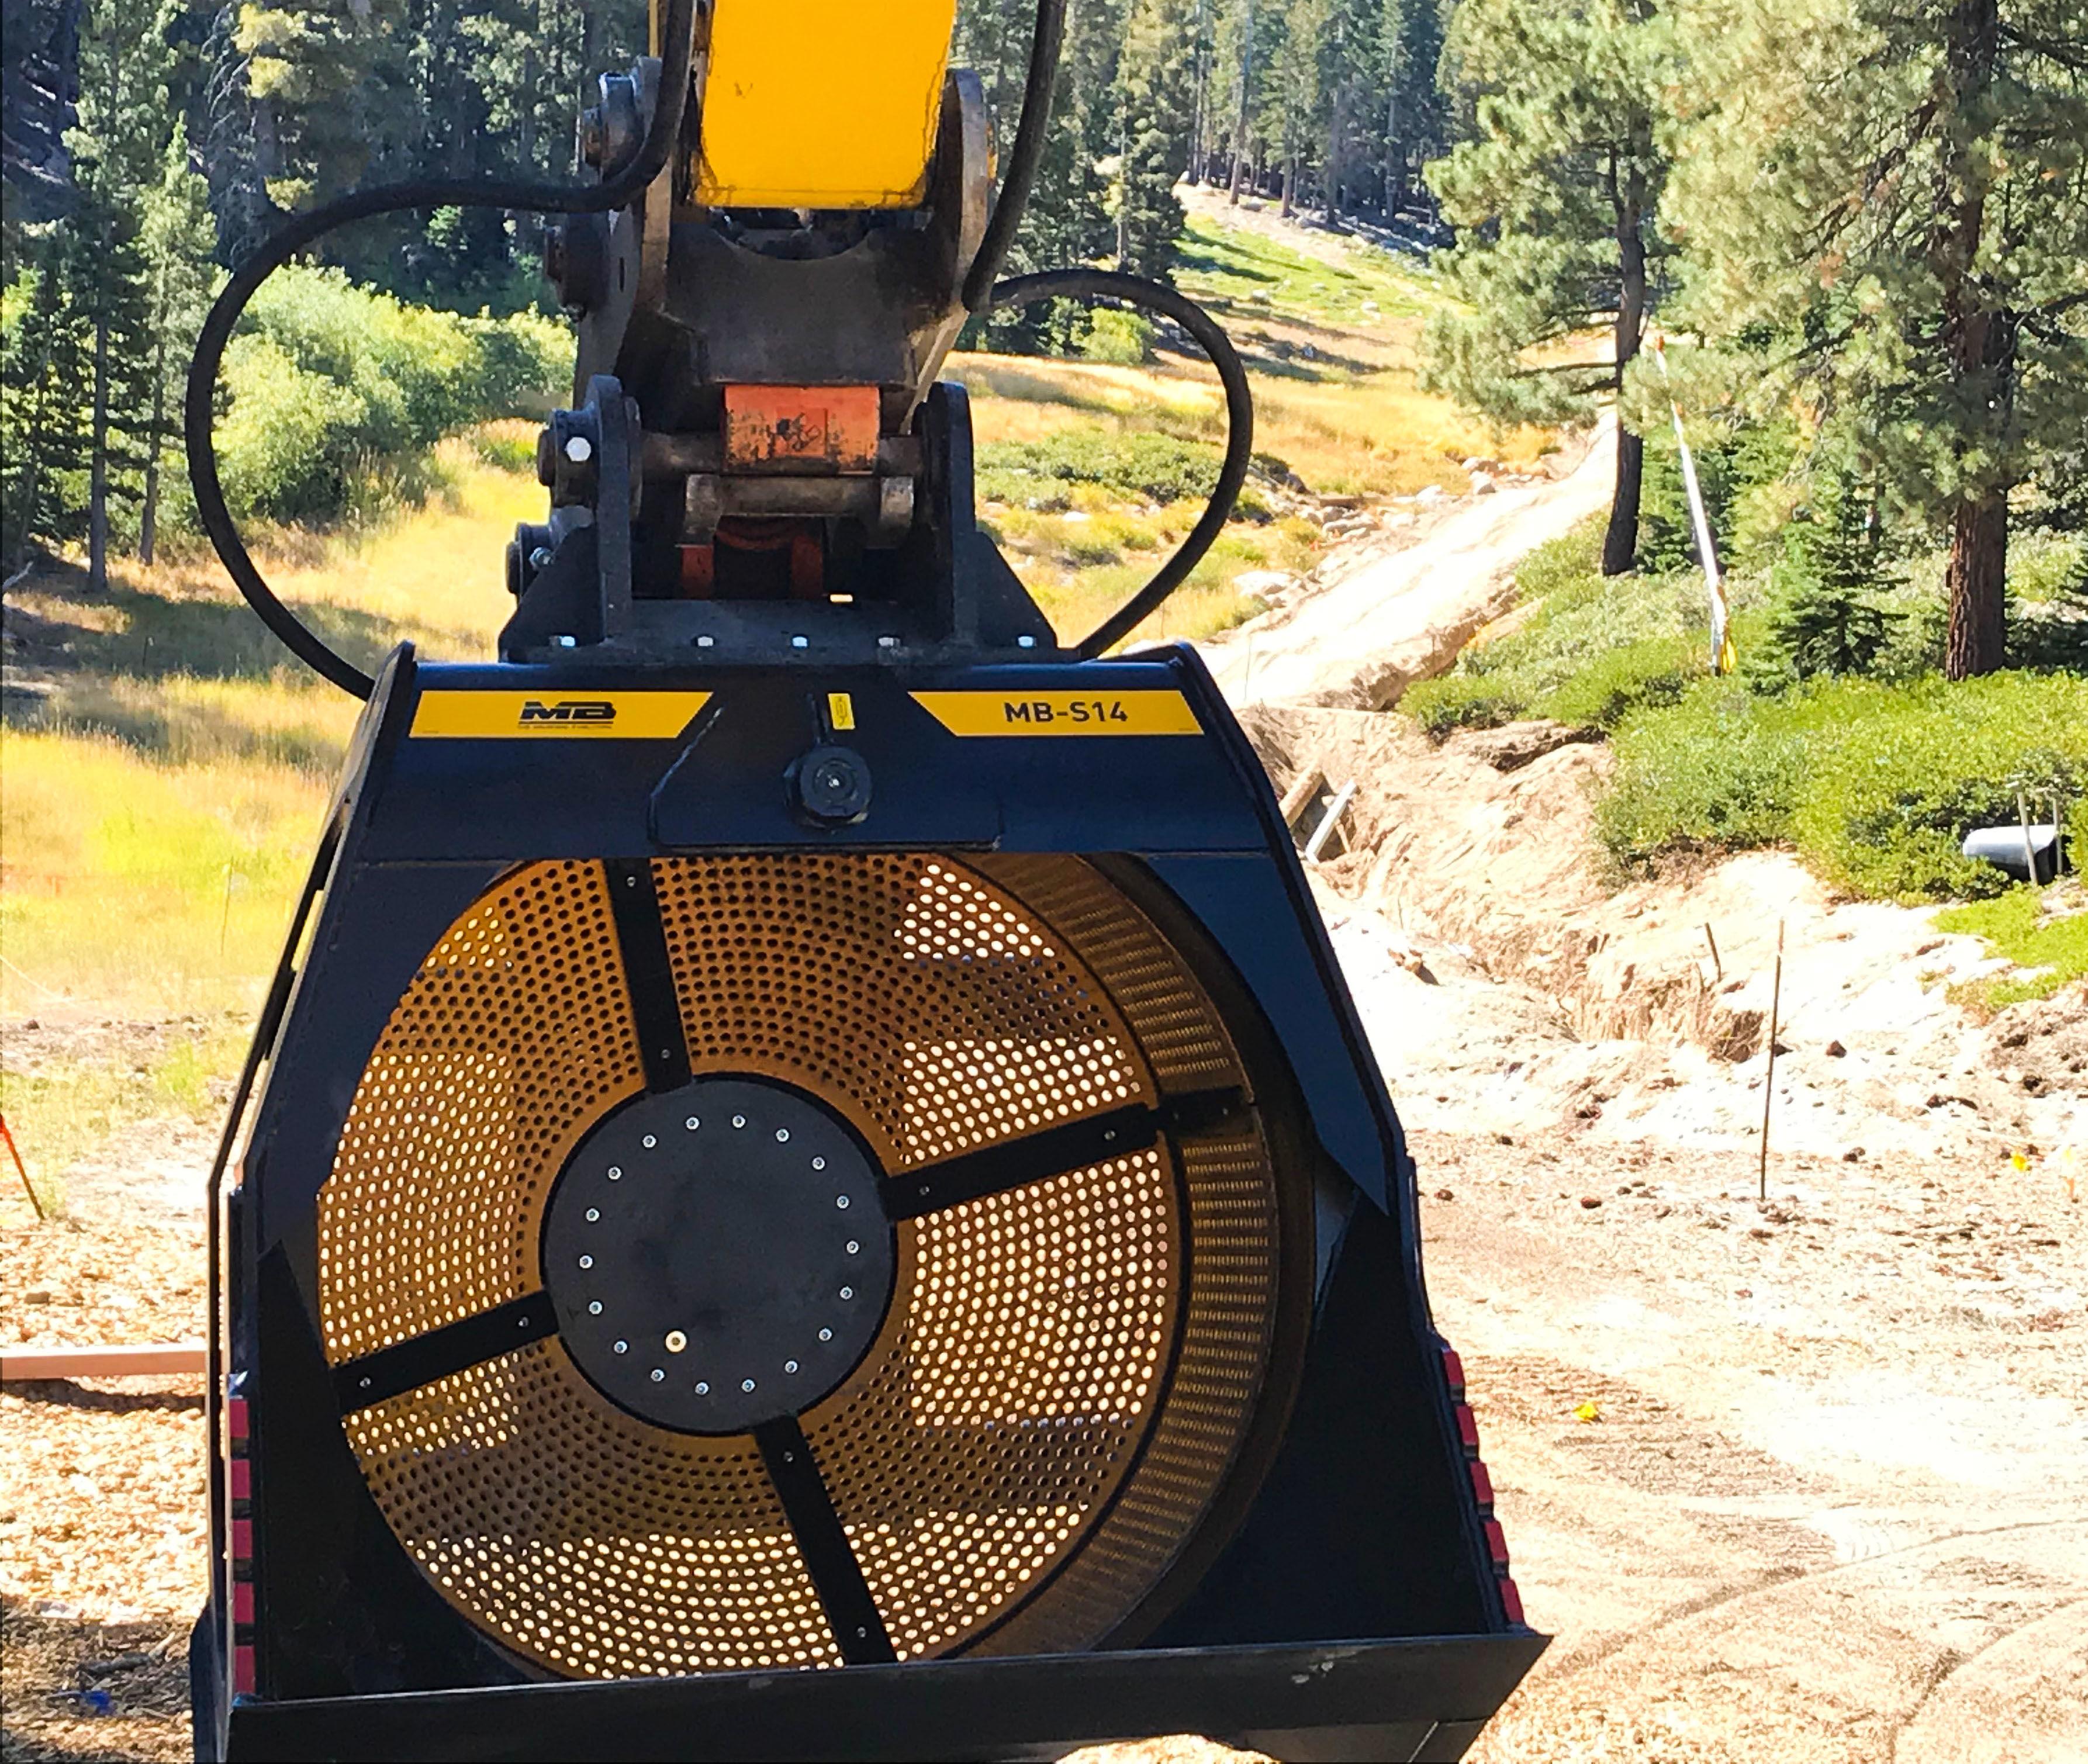 MB-S14 Screener bucket working on a ski resort in Heavenly Mountain